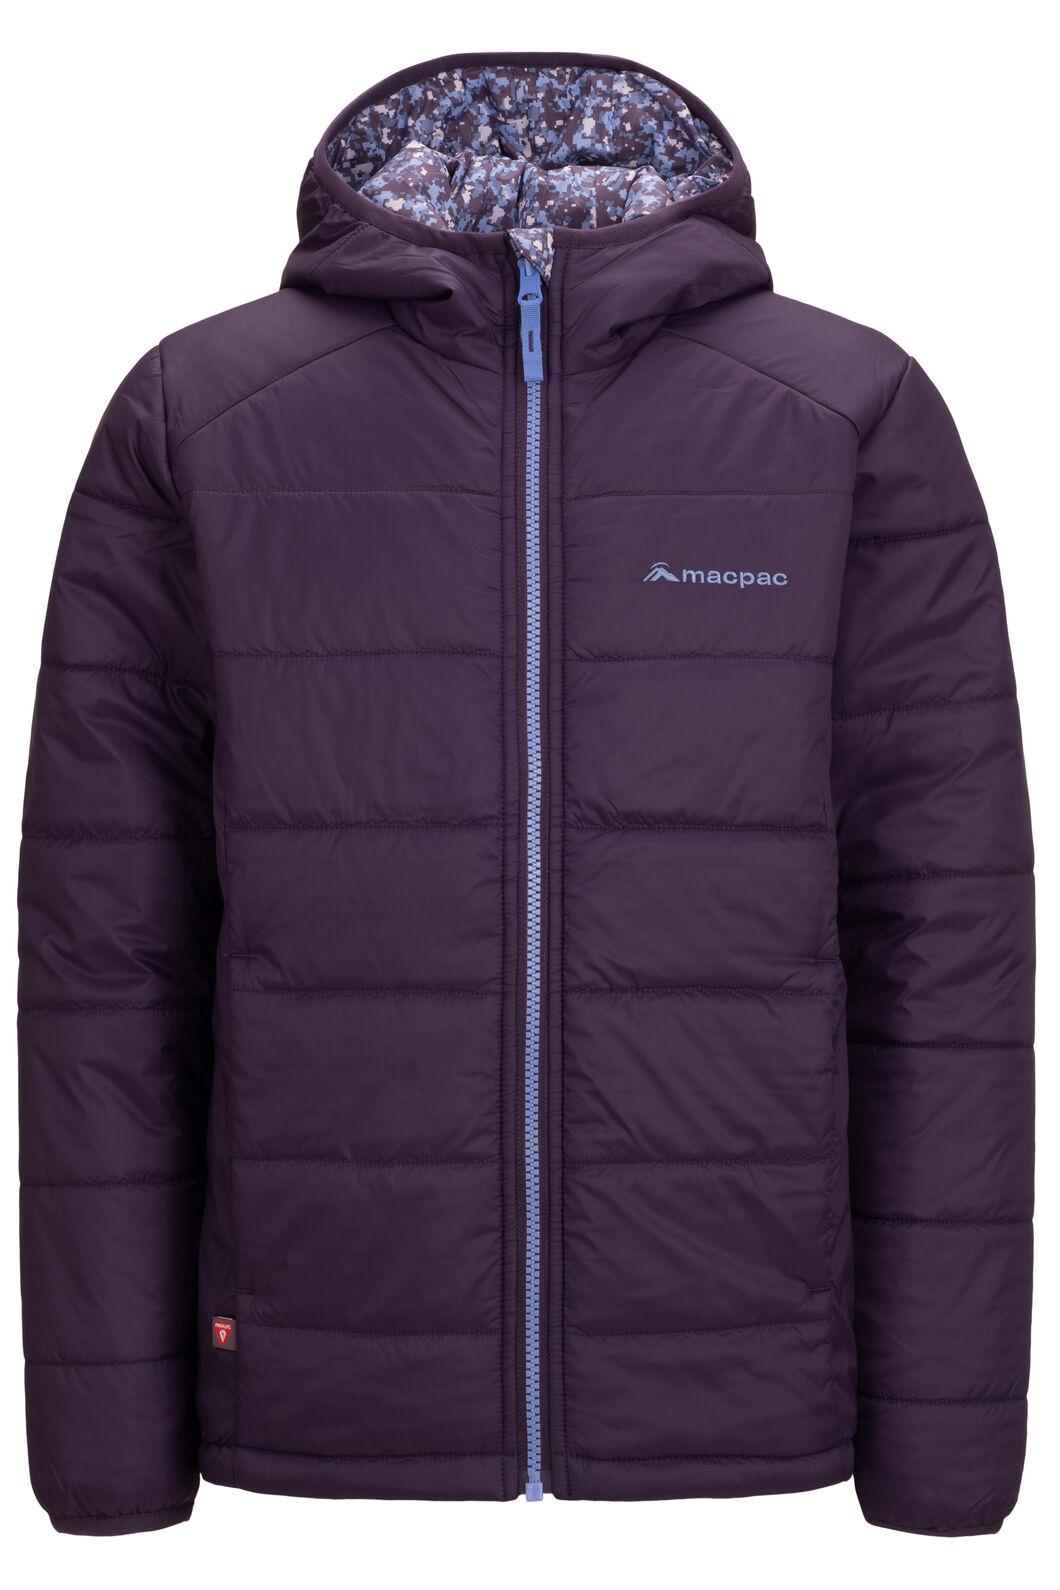 Macpac Kids' Pulsar Alpha PrimaLoft® Hooded Jacket, Nightshade Print, hi-res